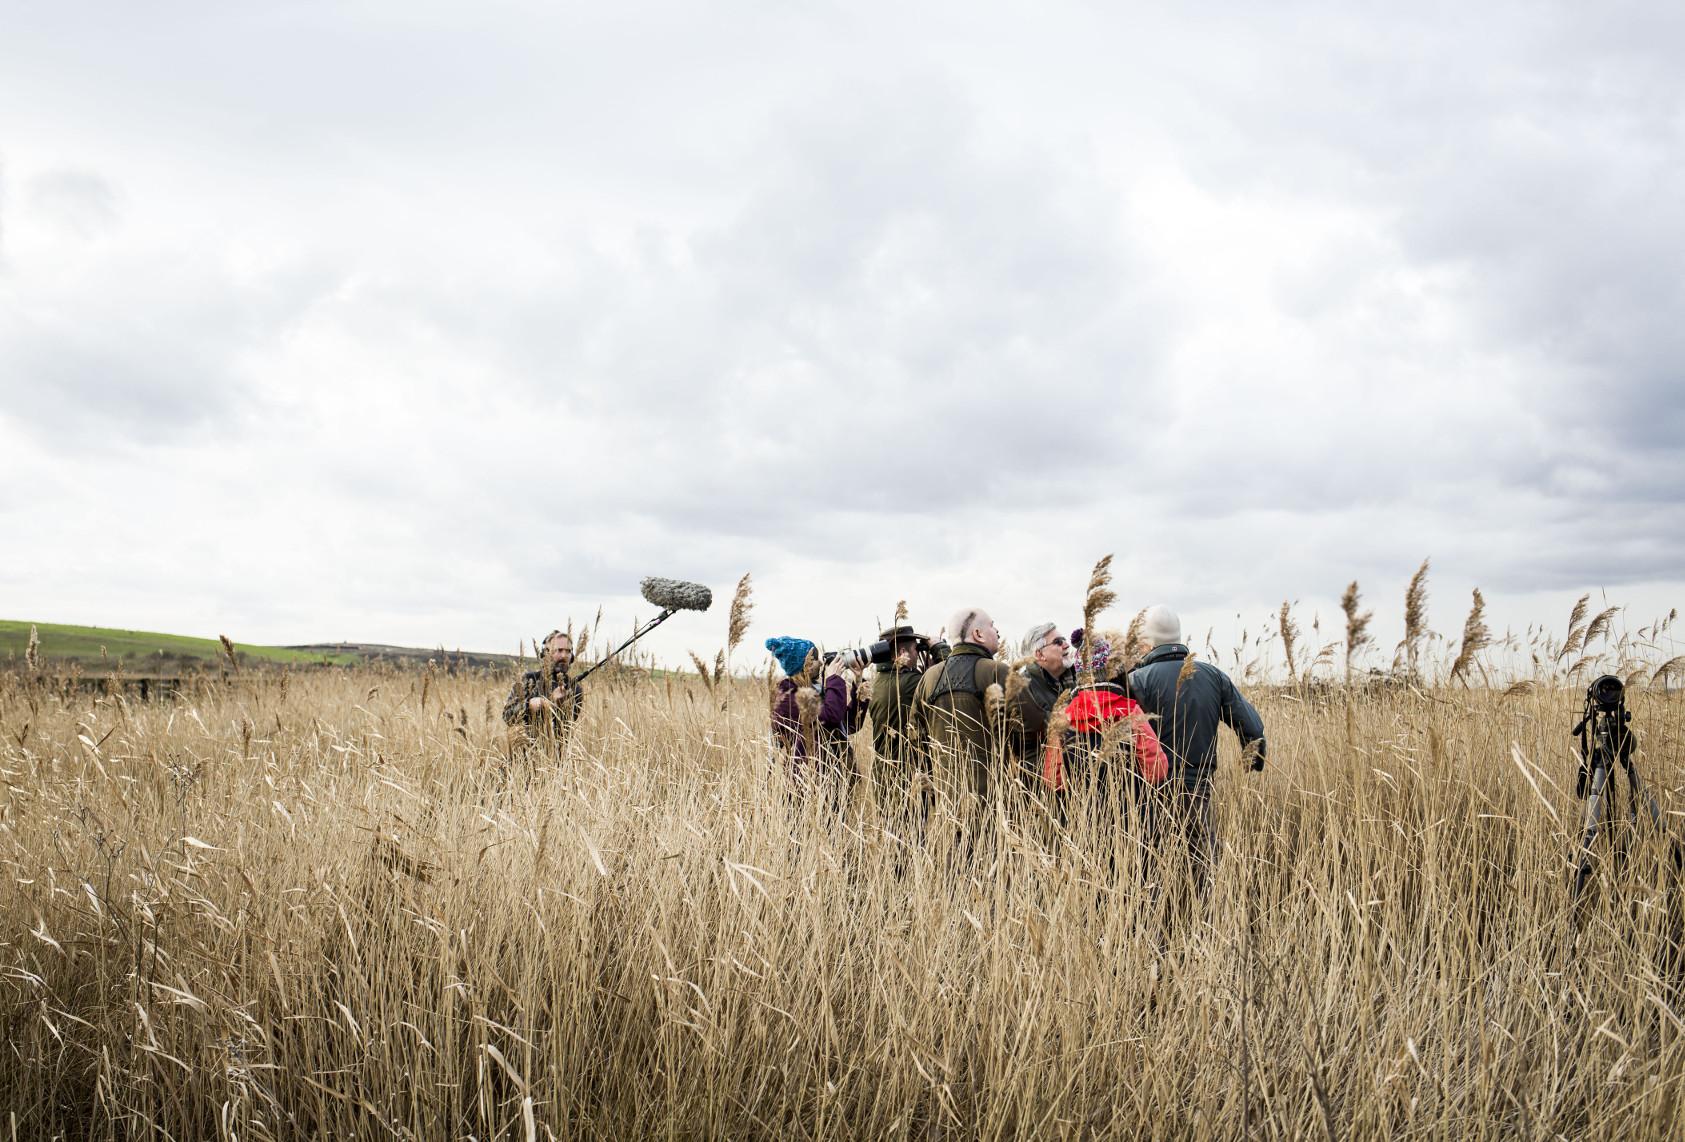 BBC Oneness, Birdwatchers, Rainham, Photographer: NAILA ZAHOOR